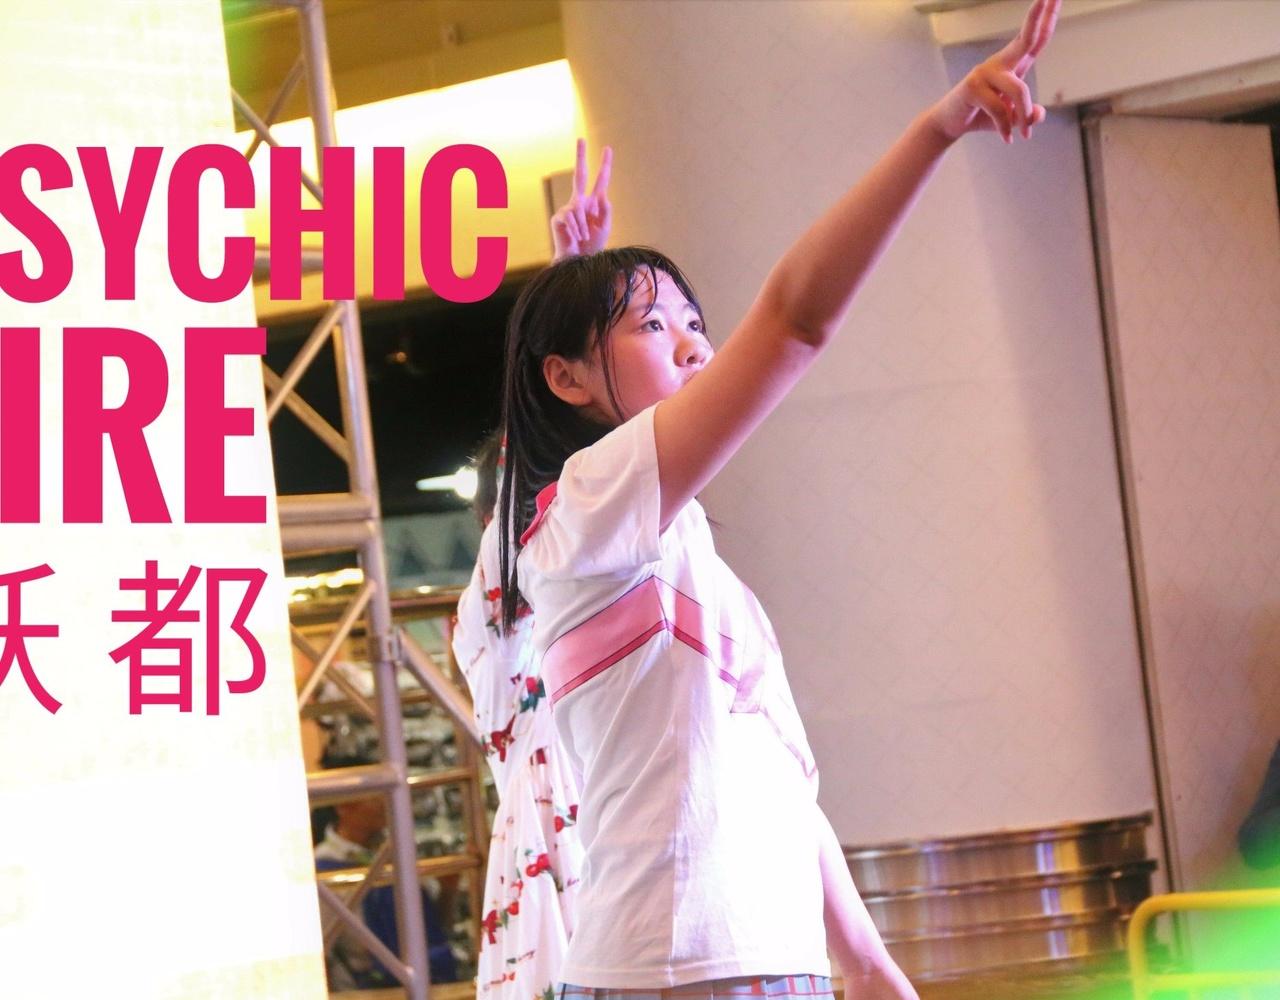 Psychic Fire 妖都萤火虫游园祭 05.3.17